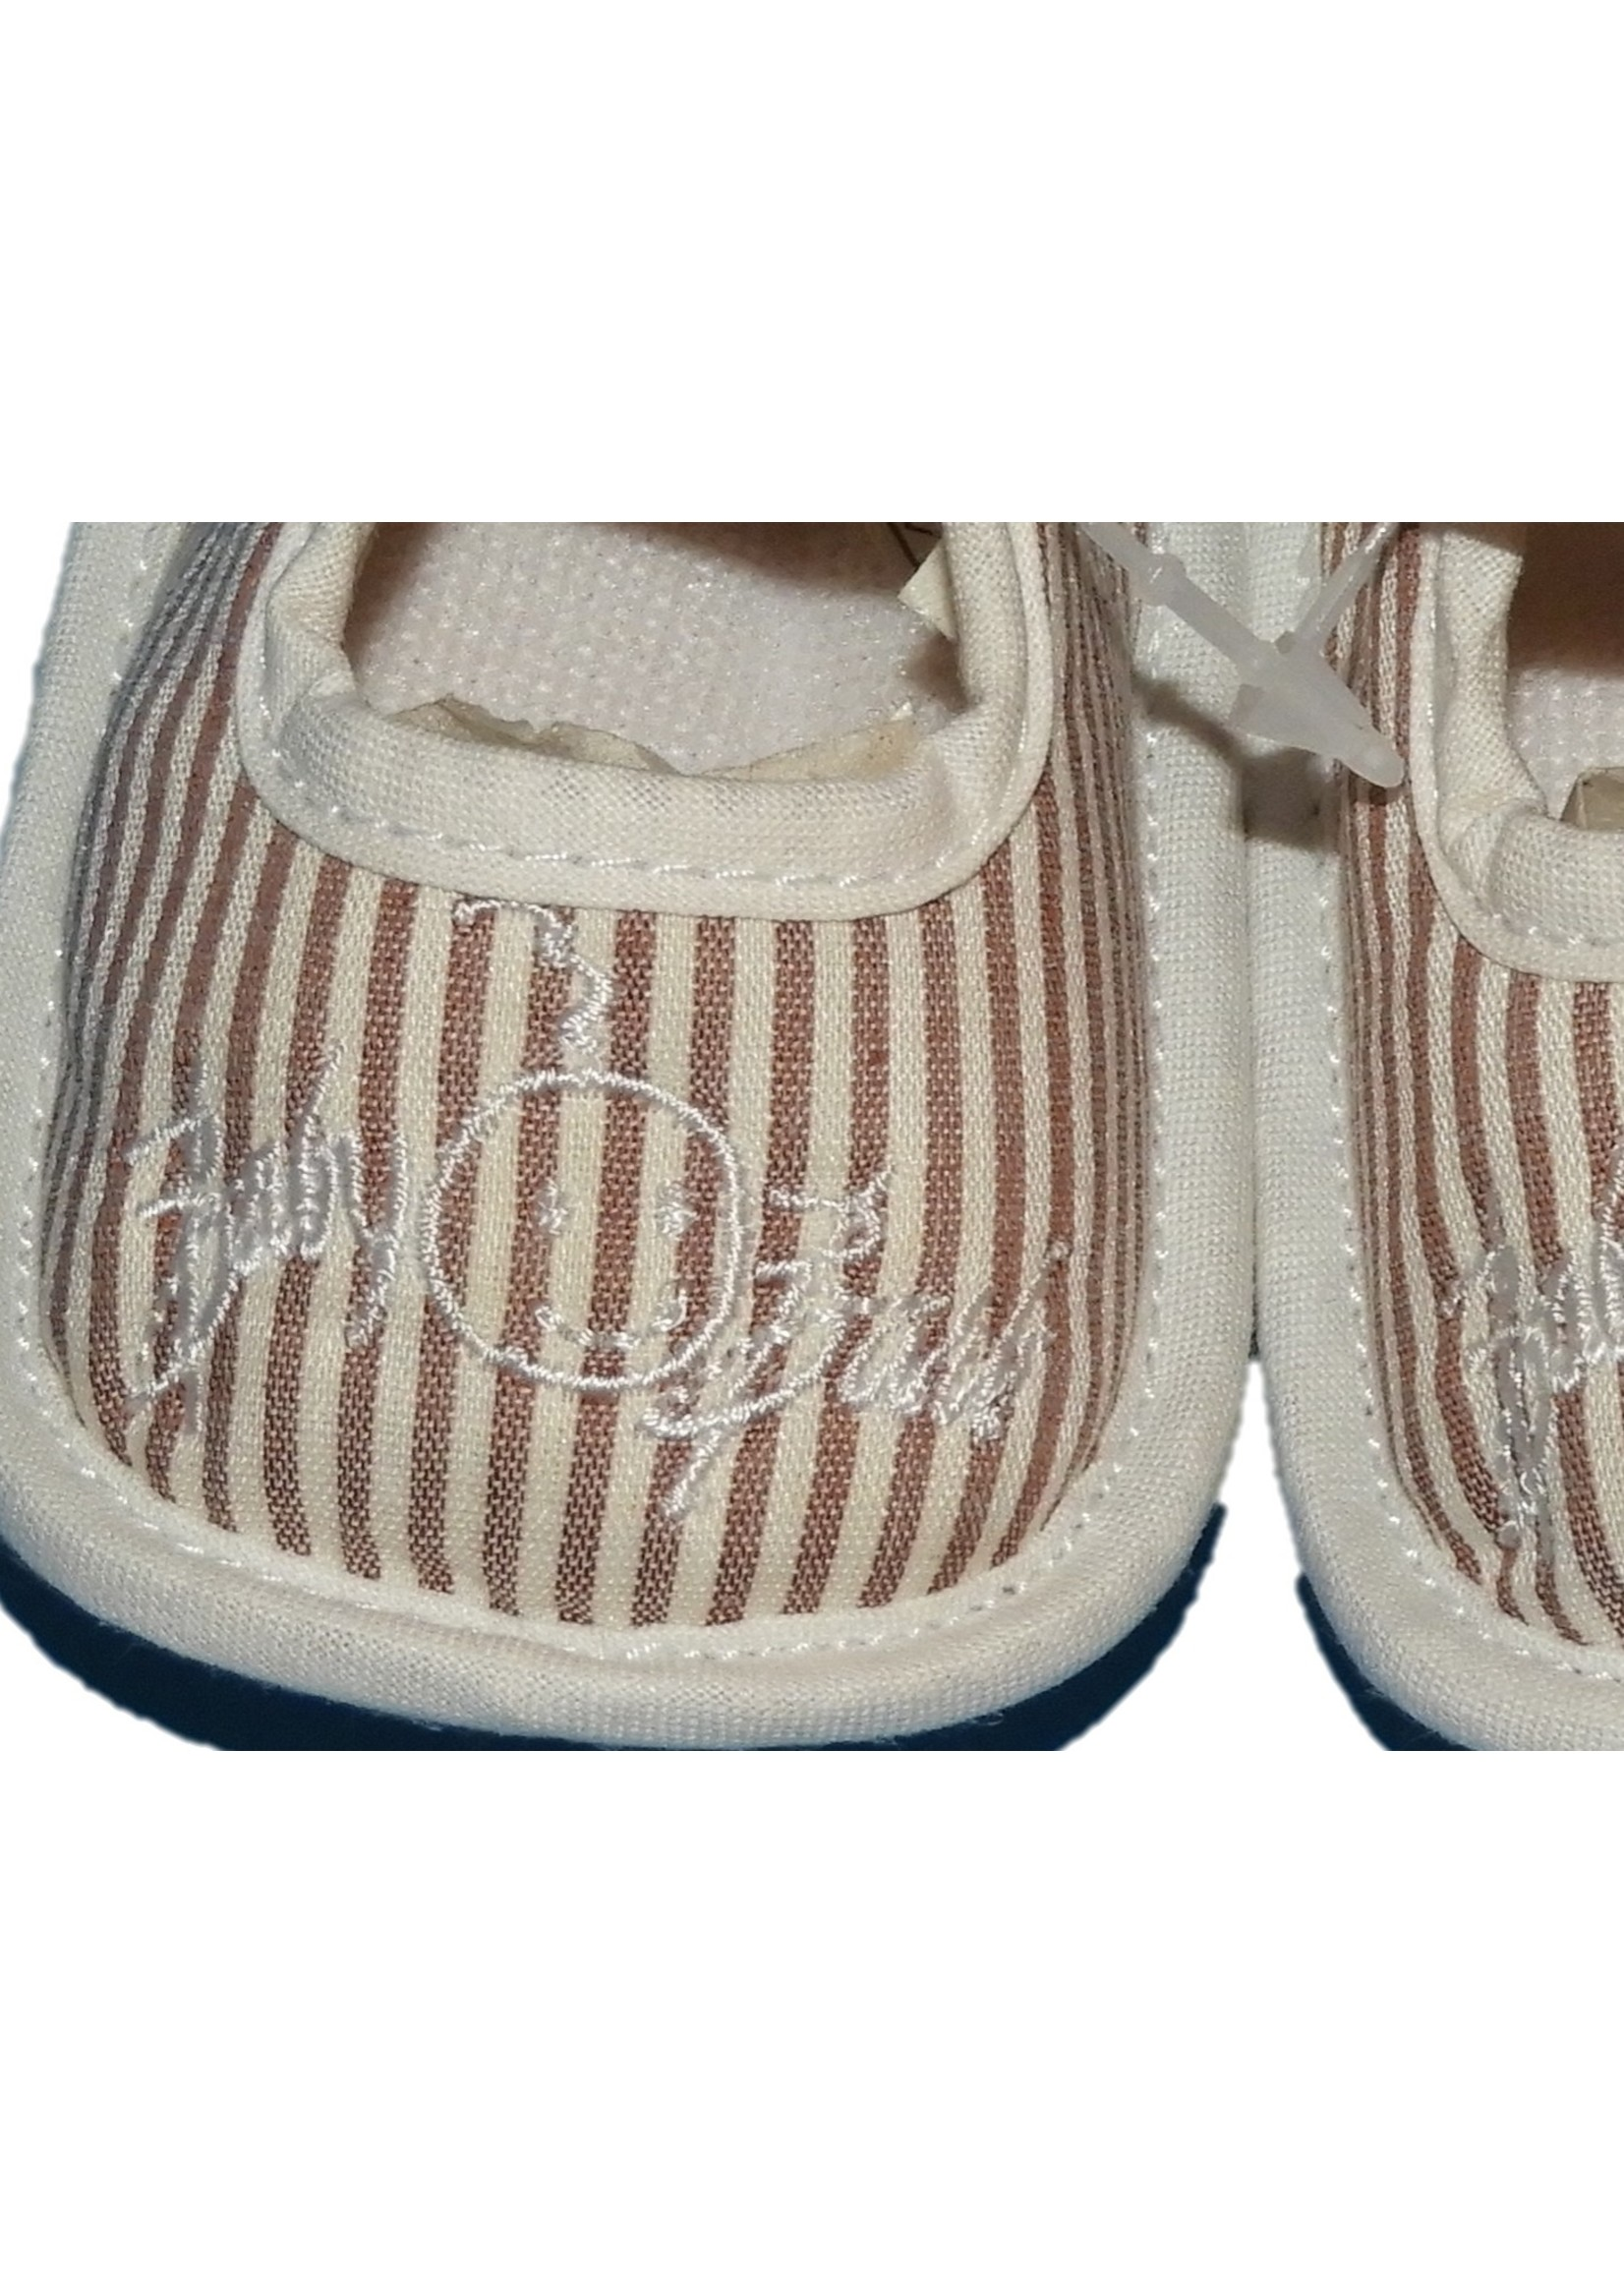 Barbara Farber schoenen maat 15 t/m 18